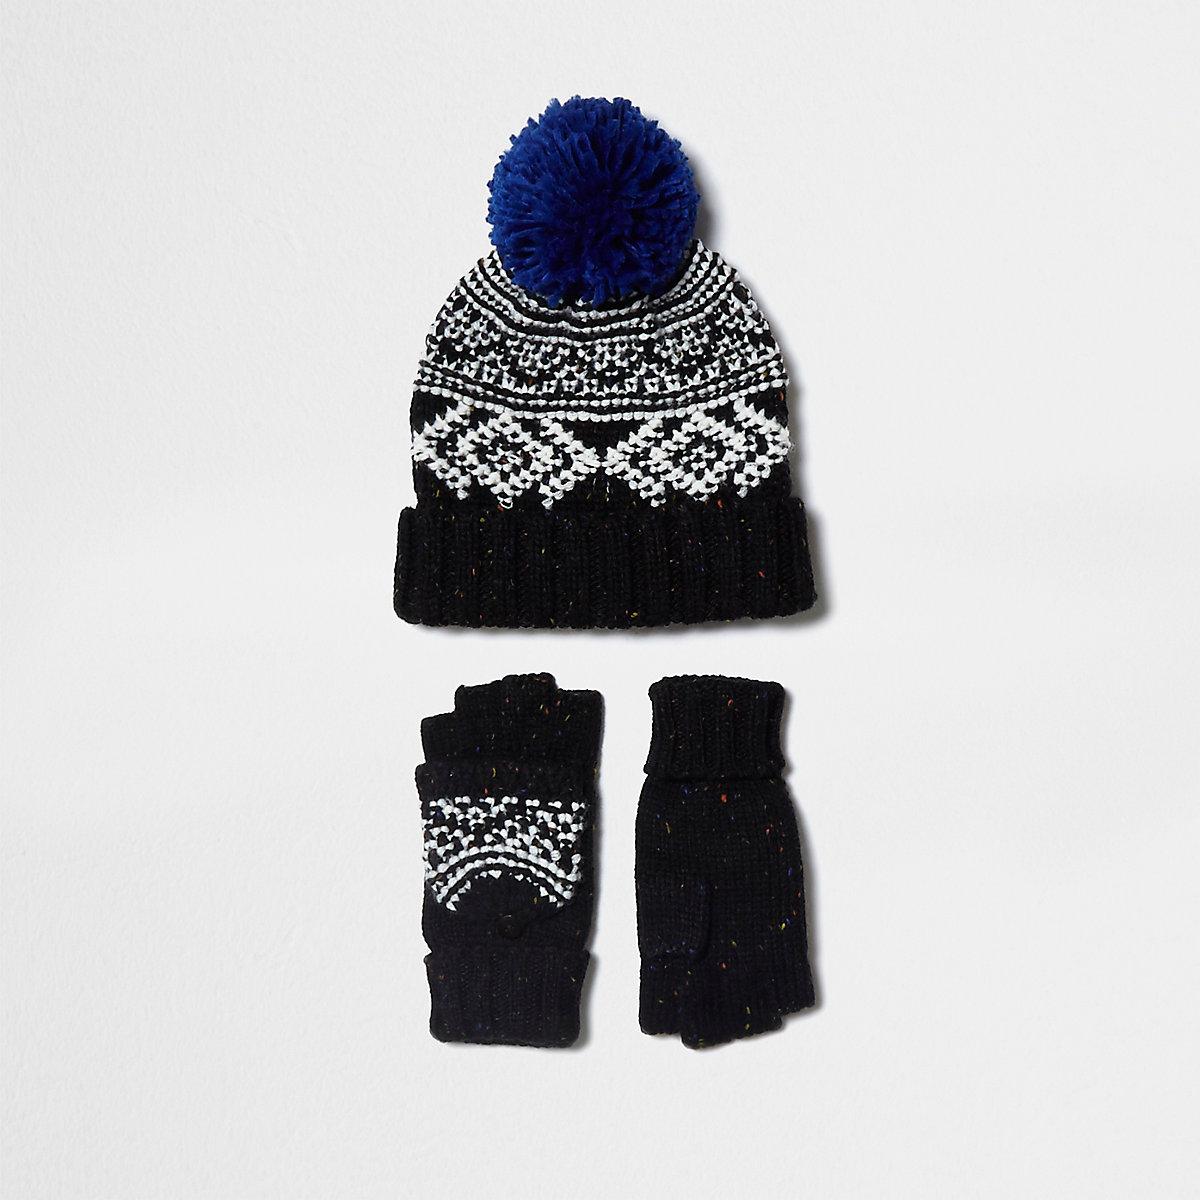 16079816ffde9 Boys black Fairisle hat and mittens set - Accessories - Sale - boys